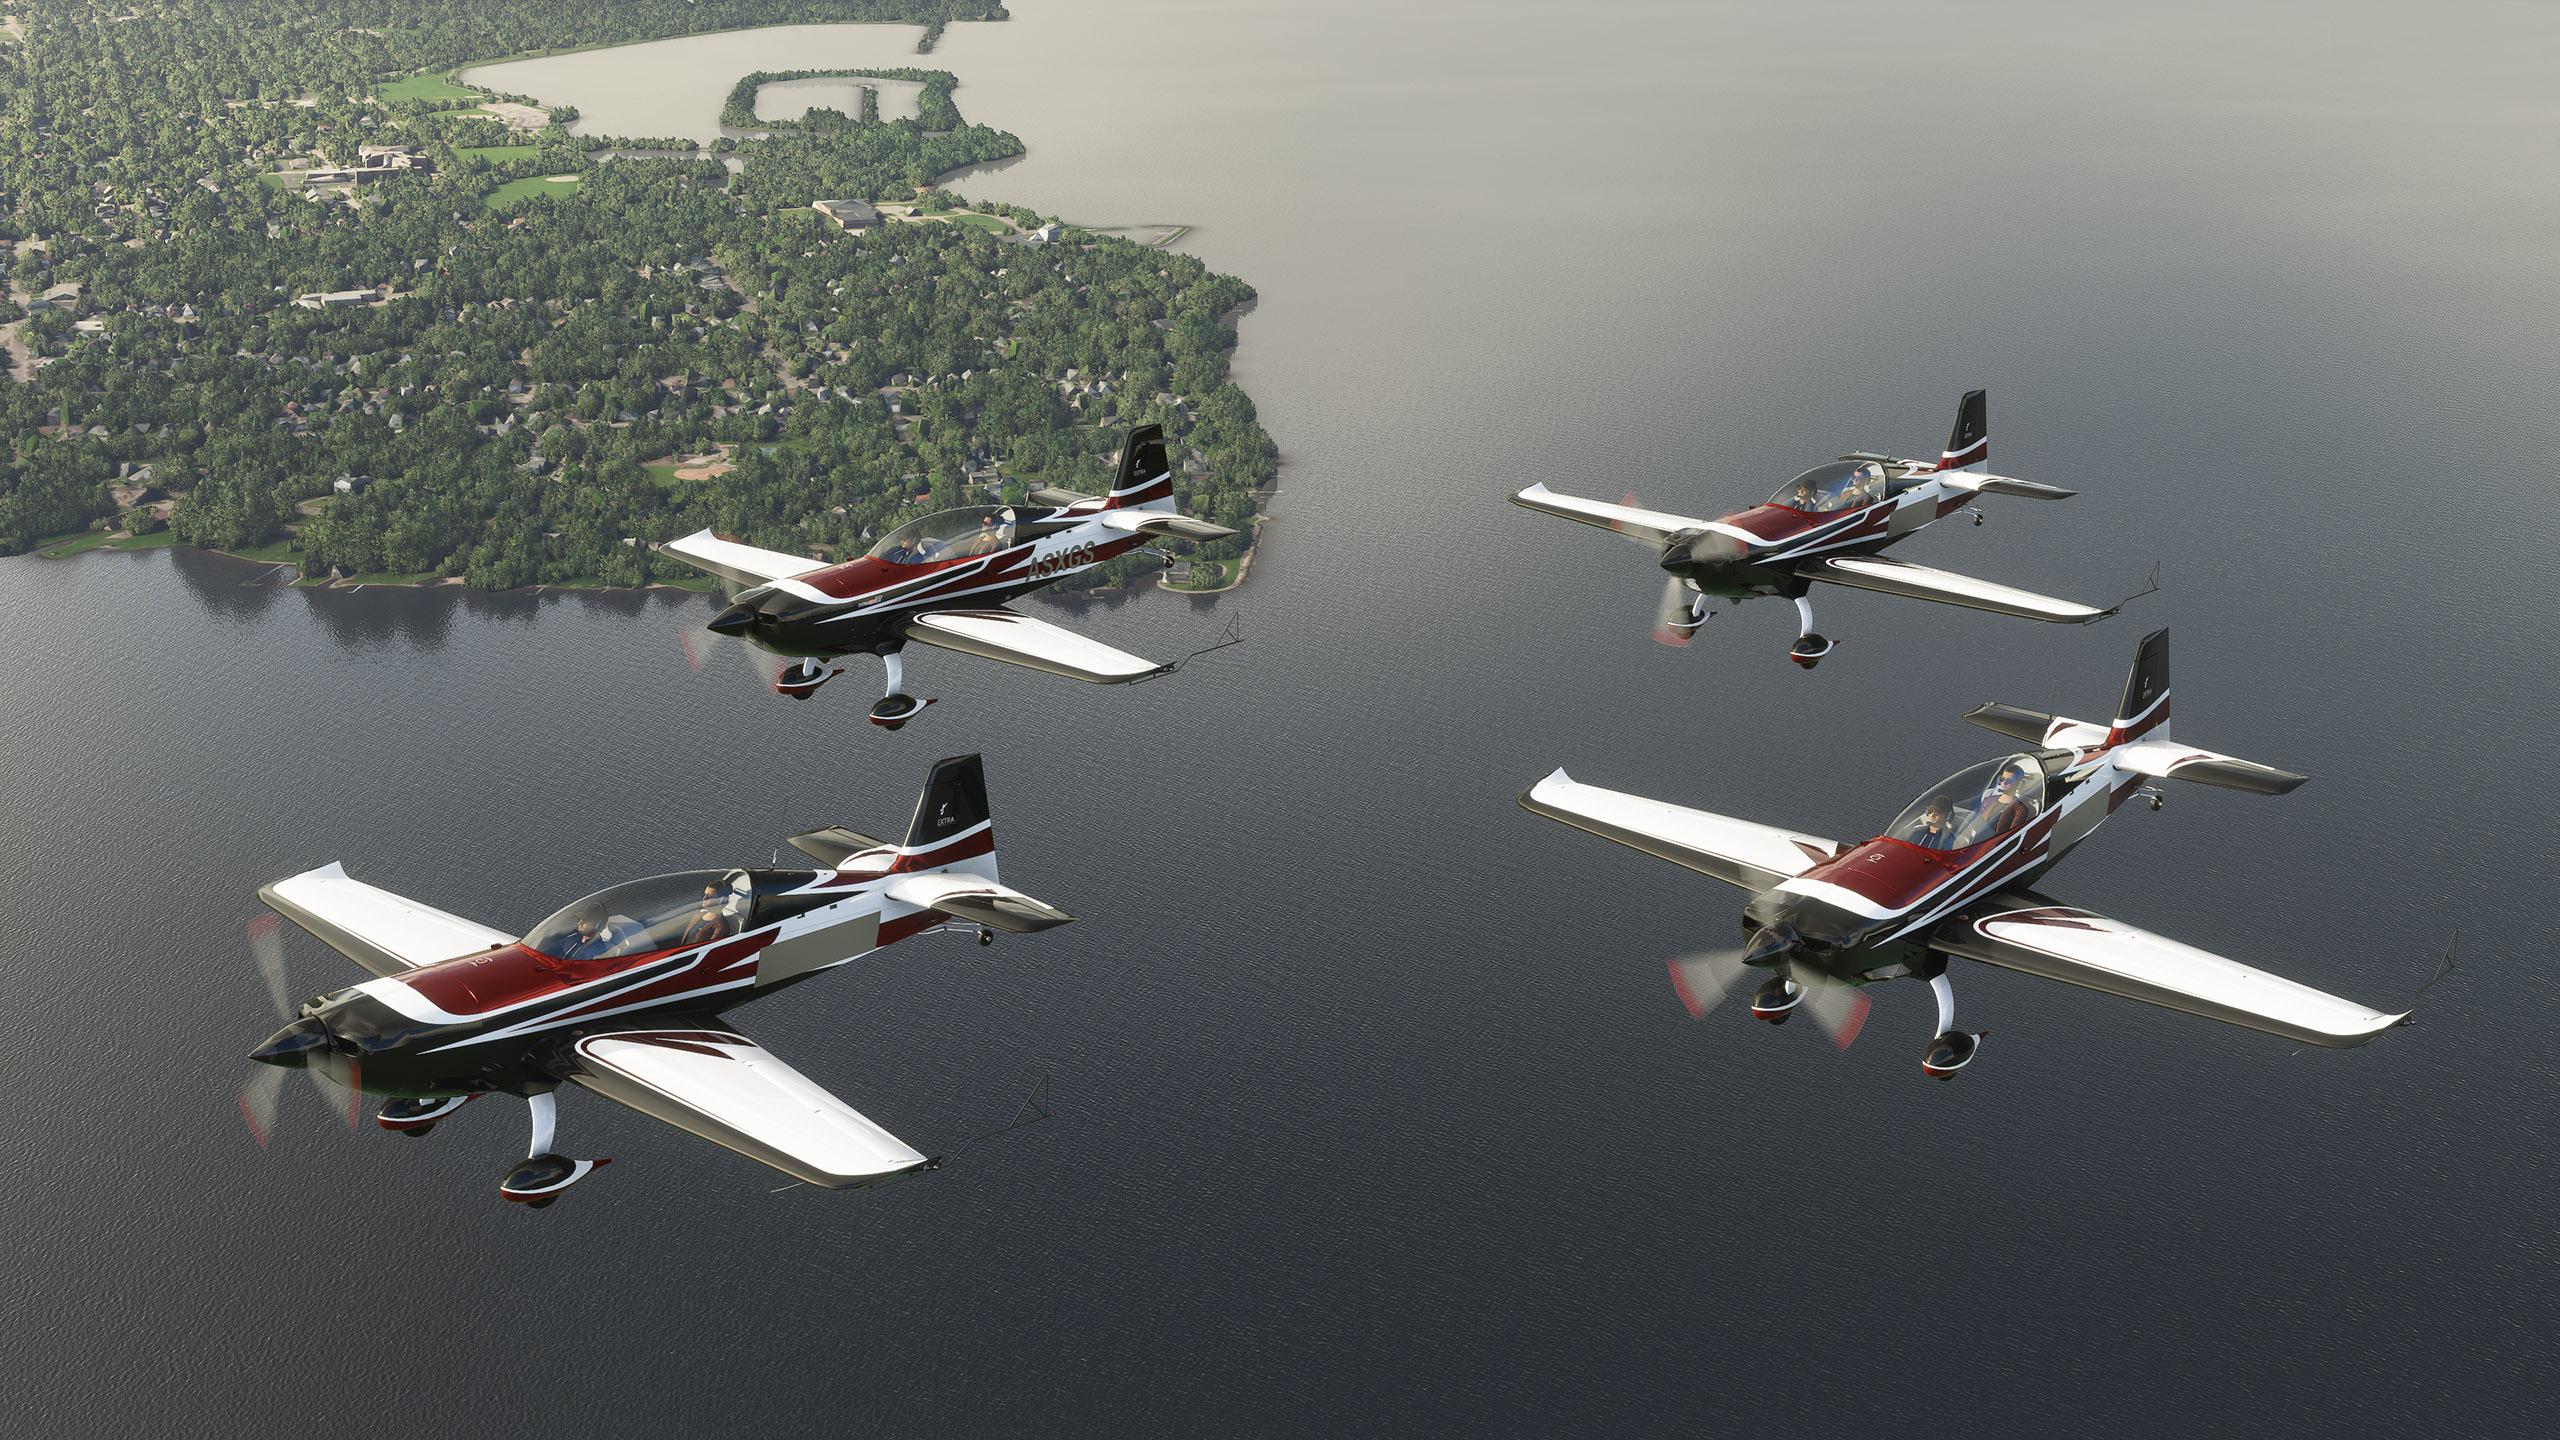 How to play multiplayer - Microsoft Flight Simulator 2020 ...